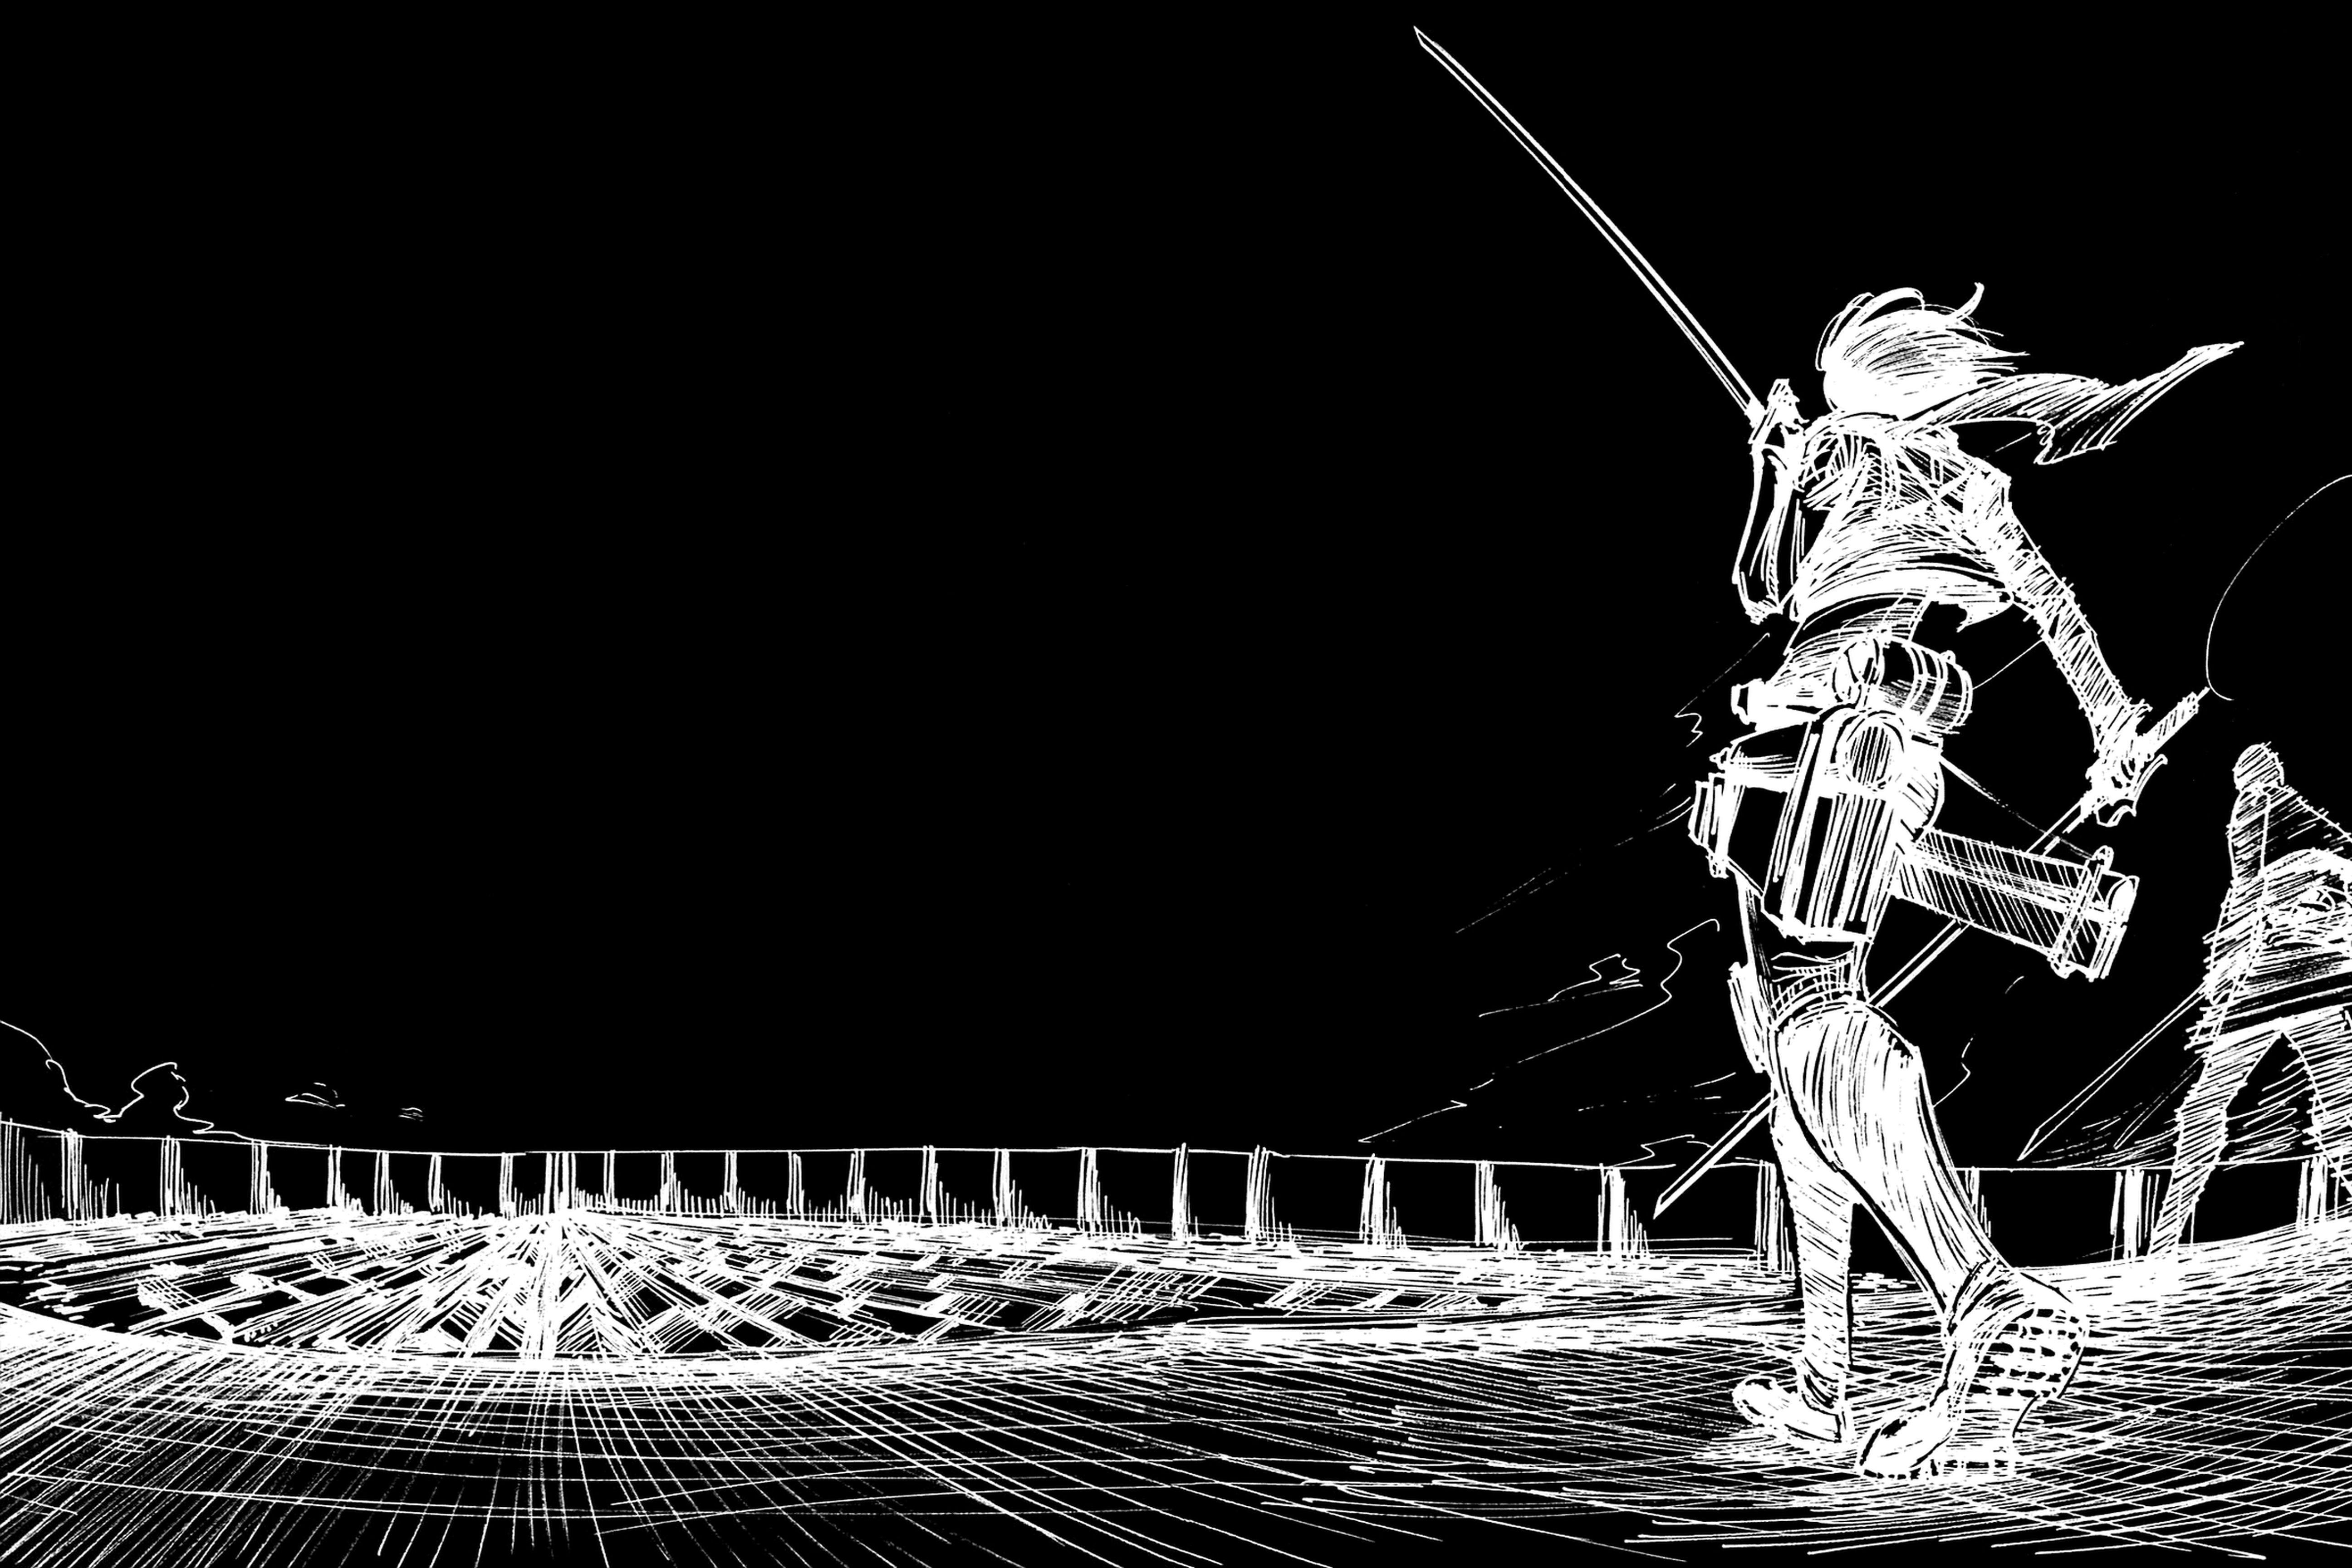 Wallpaper Attack On Titans Shingeki No Kyojin Mikasa Ackerman Gadis Anime Pedang Senjata 5184x3456 San99 1862963 Hd Wallpapers Wallhere